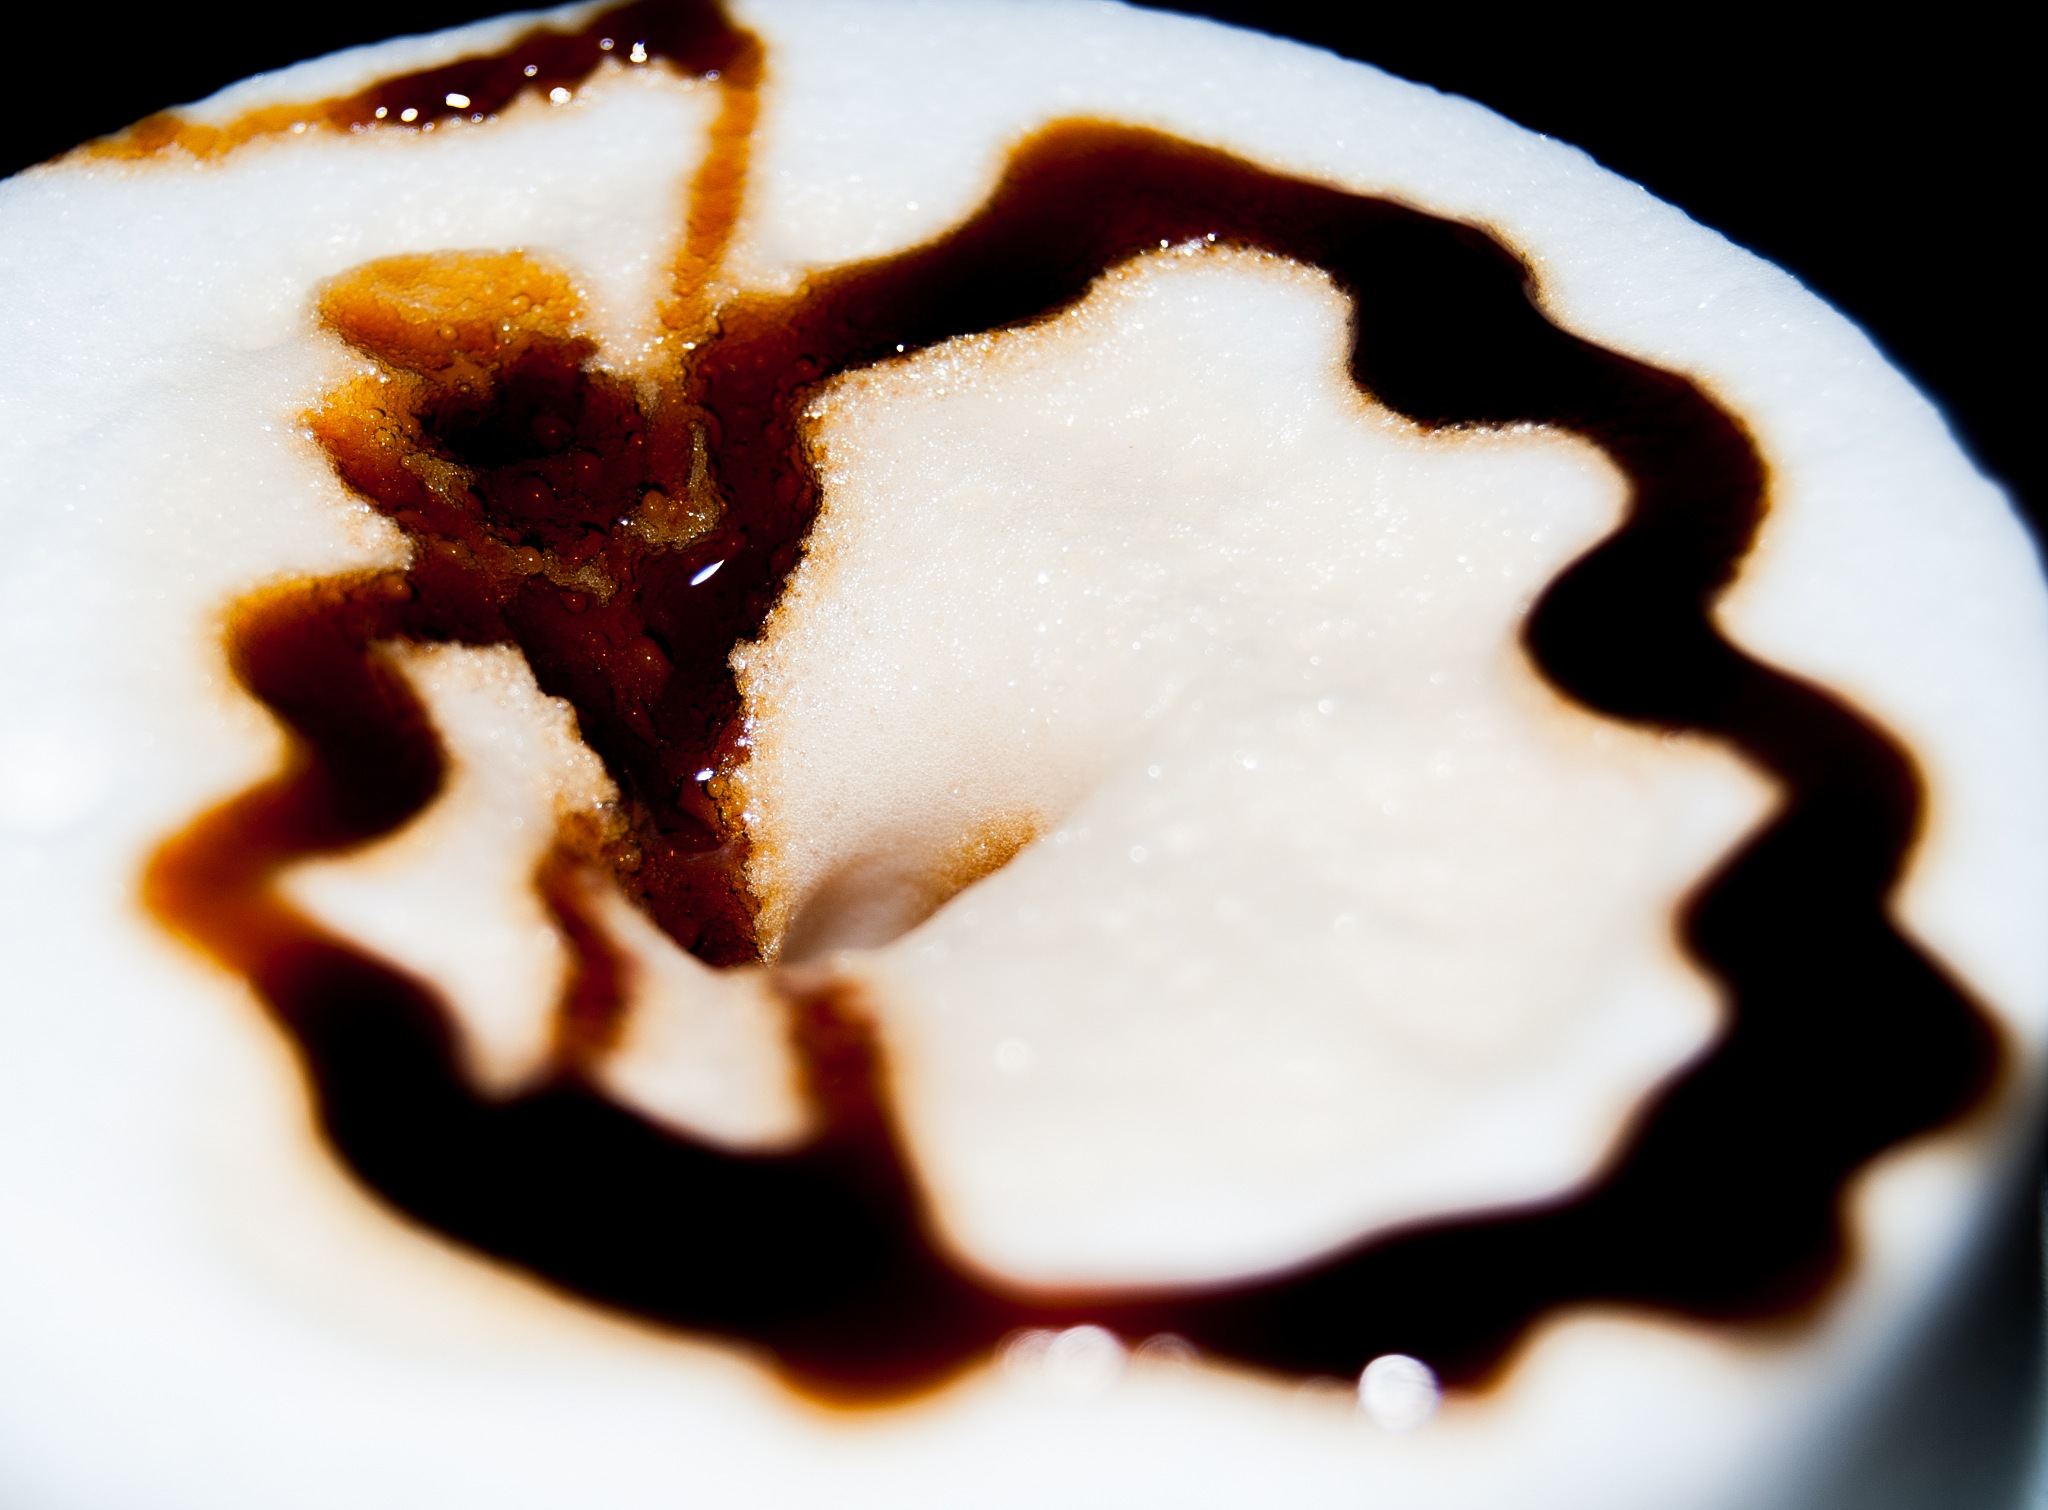 fun with a coffee by Thomas Adamski